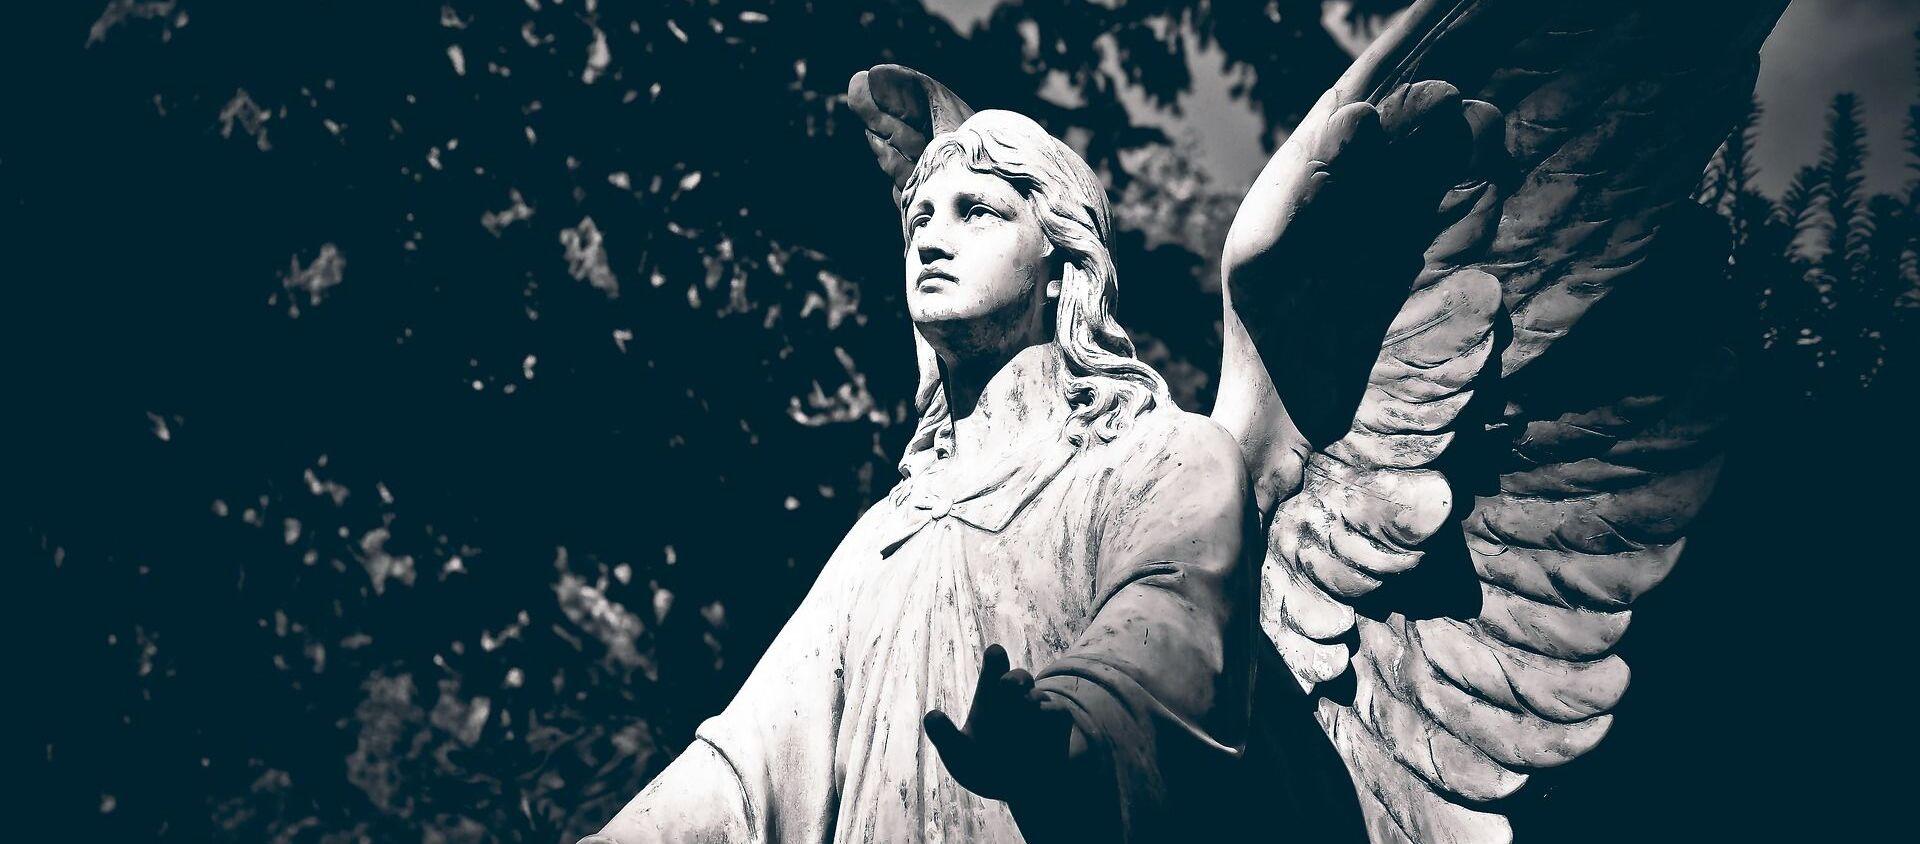 Un cementerio, referencial - Sputnik Mundo, 1920, 03.04.2020